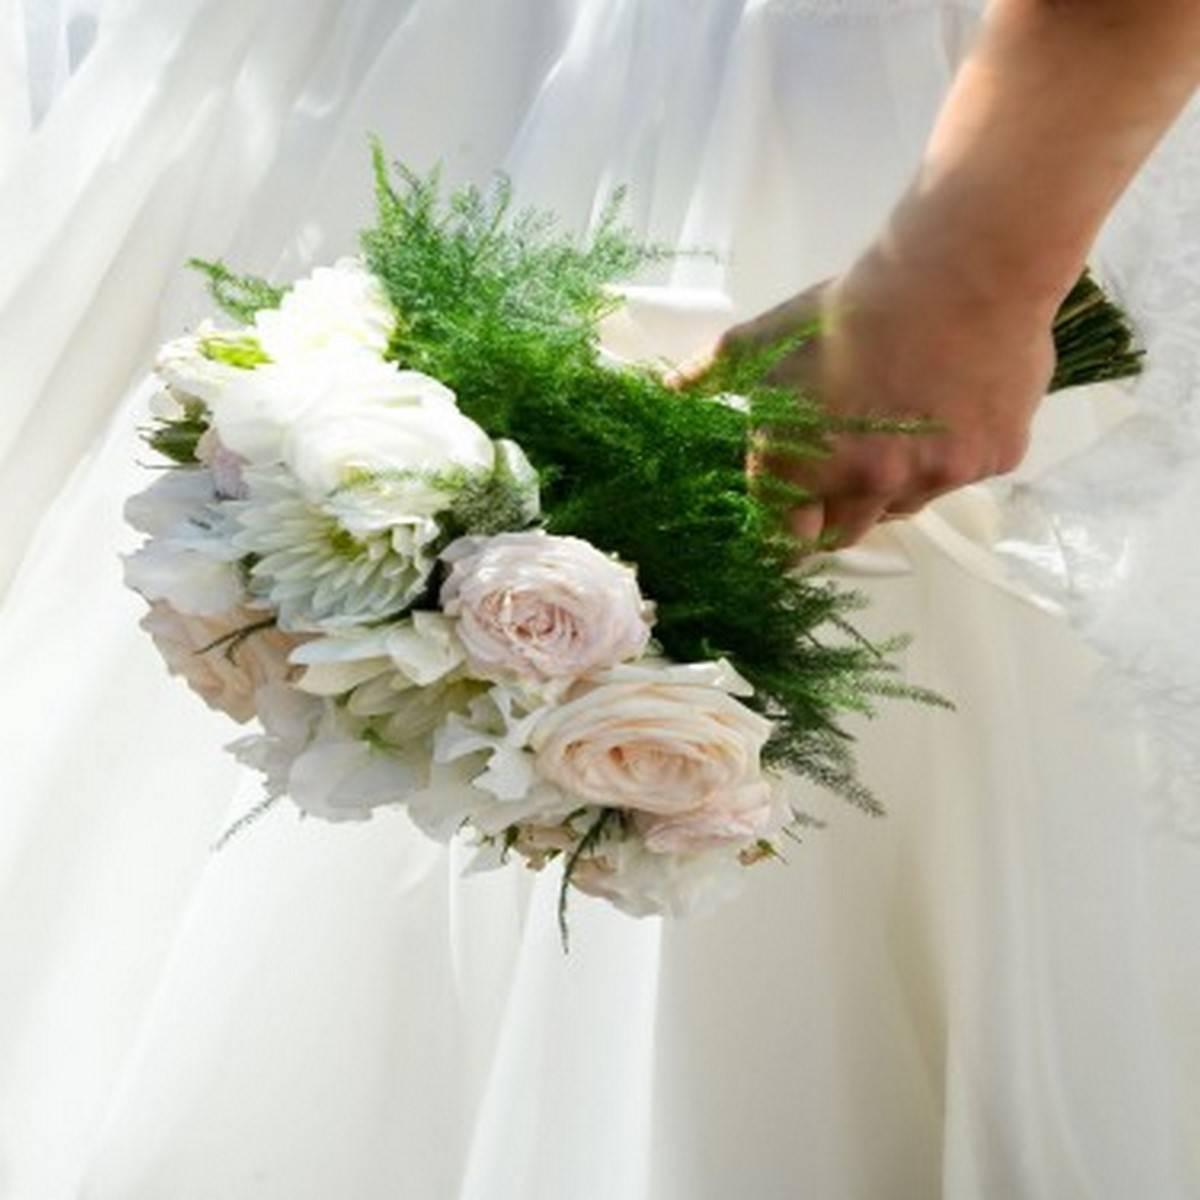 Matrimonio Country Chic Padova : Wedding planner a padova venezia treviso maison mariage